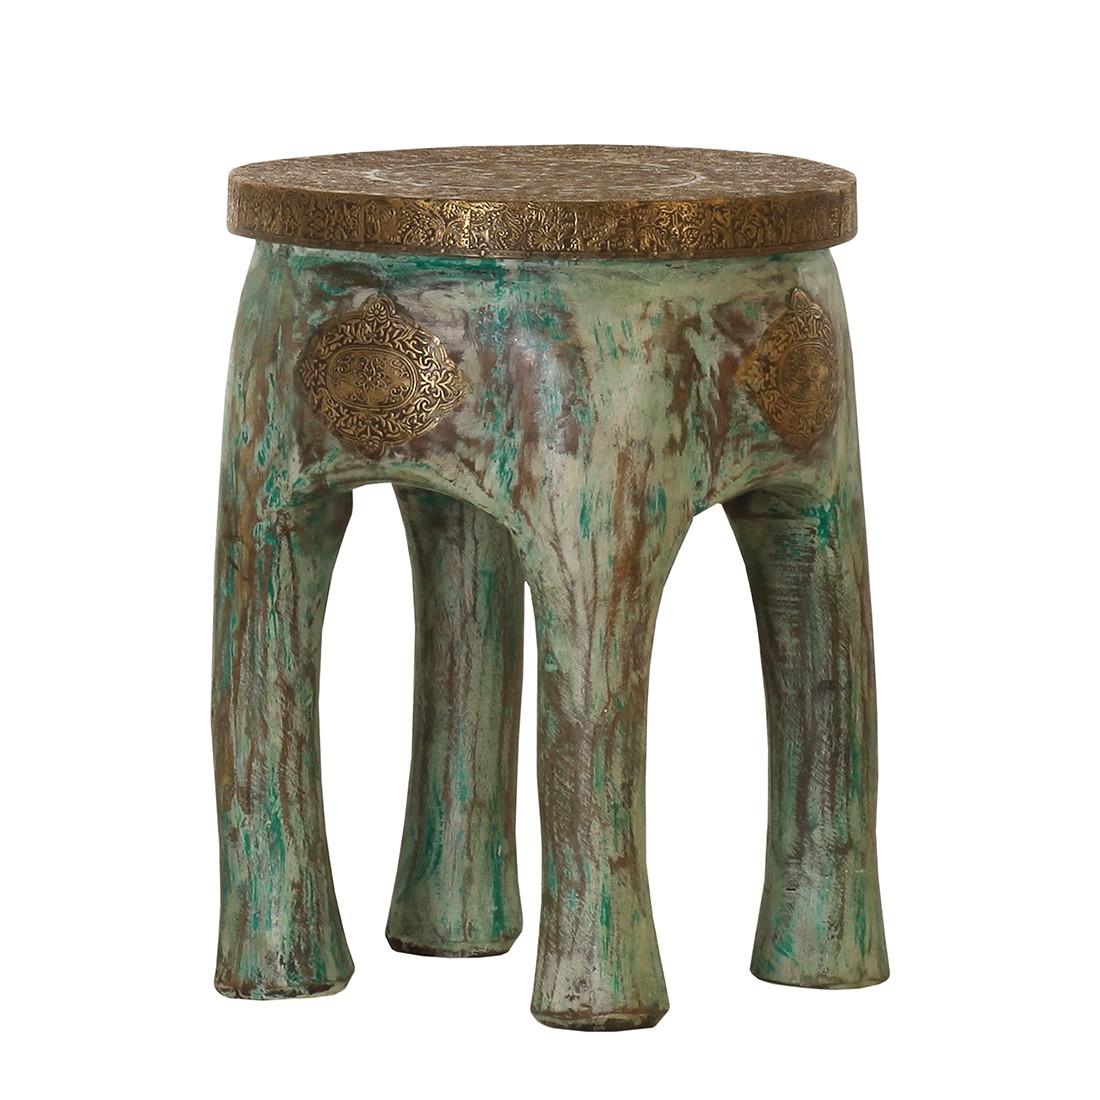 Hocker Himba – Mango Massiv – gebeizt/lackiert – Braun/Grün, ars manufacti online kaufen